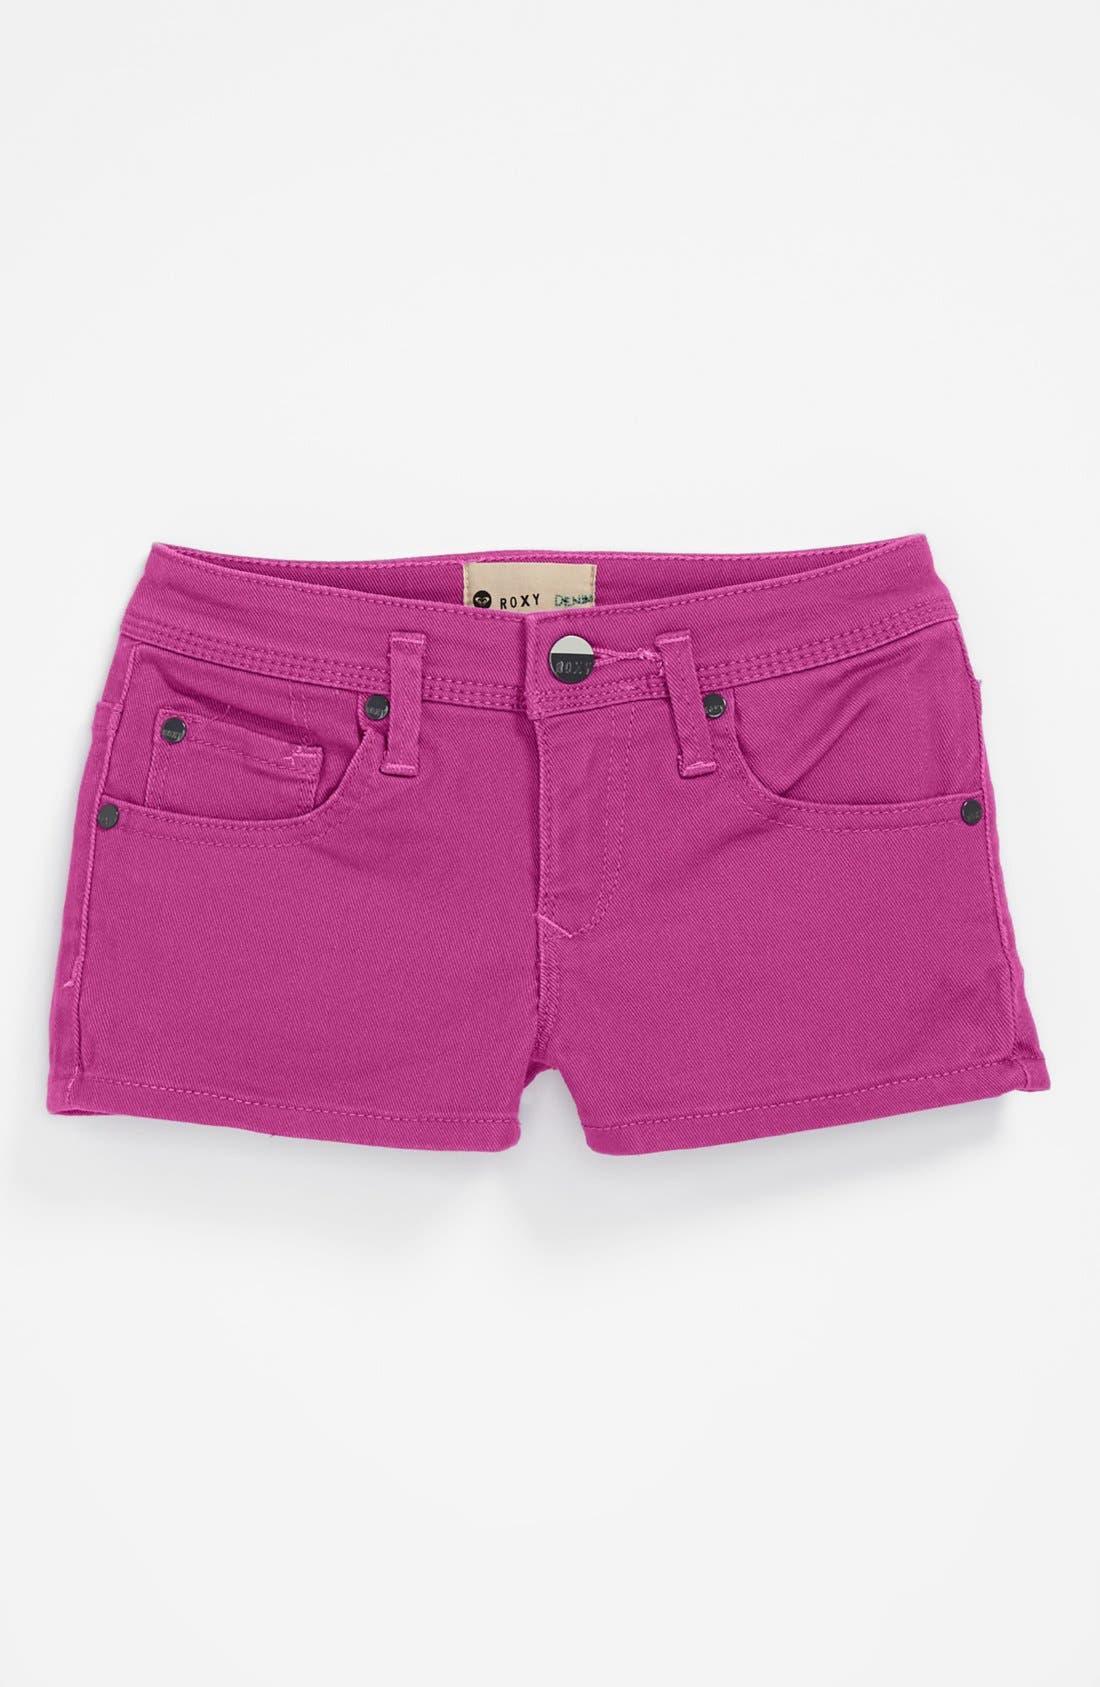 Alternate Image 2  - Roxy 'Ferris Wheel' Denim Shorts (Big Girls)